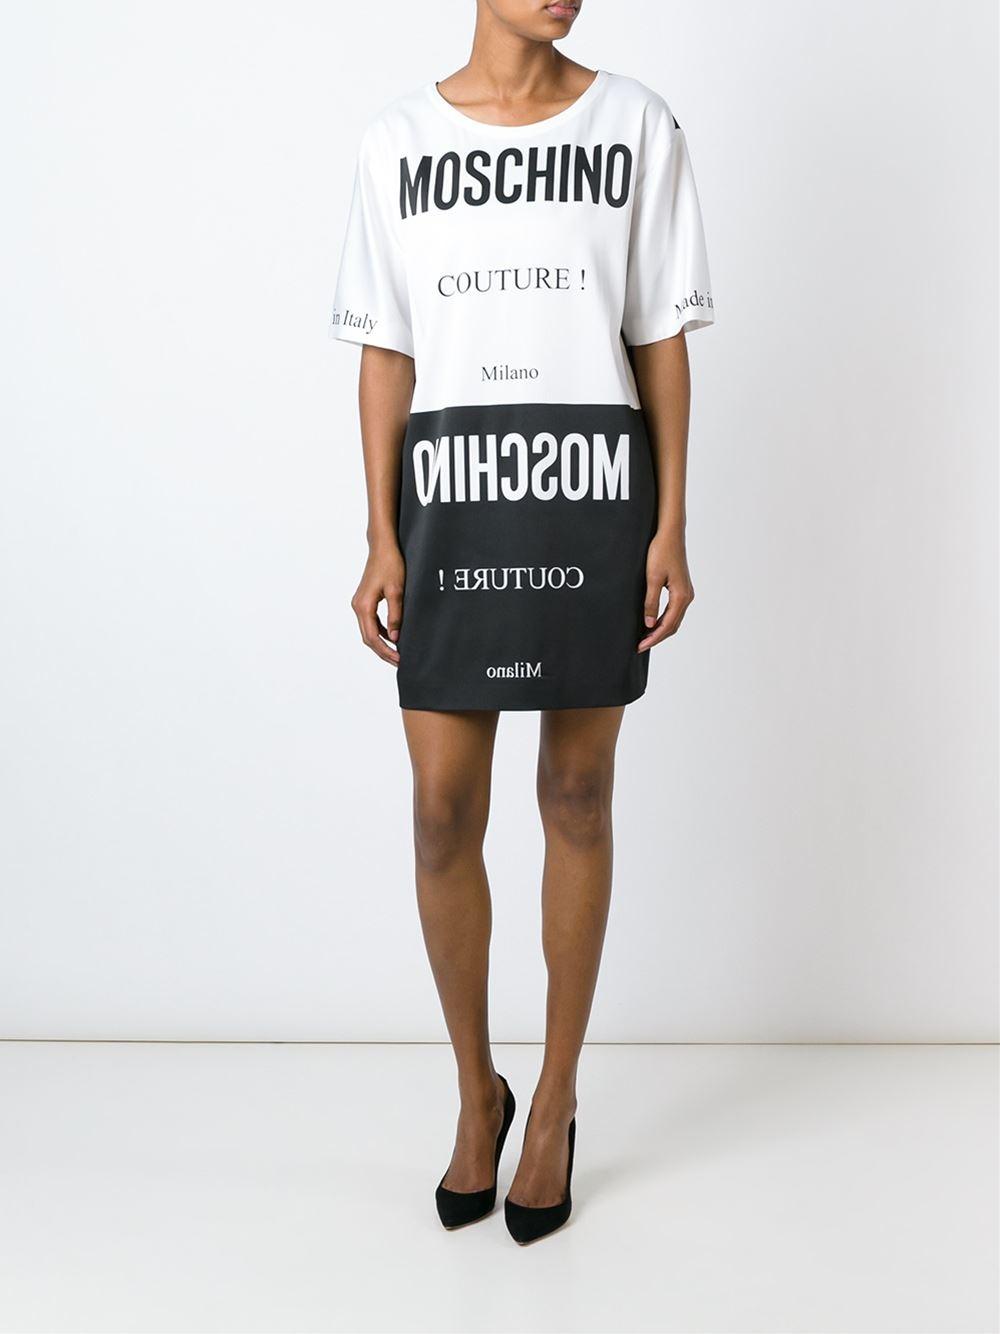 Lyst moschino logo print t shirt dress in black for Logo t shirt dress